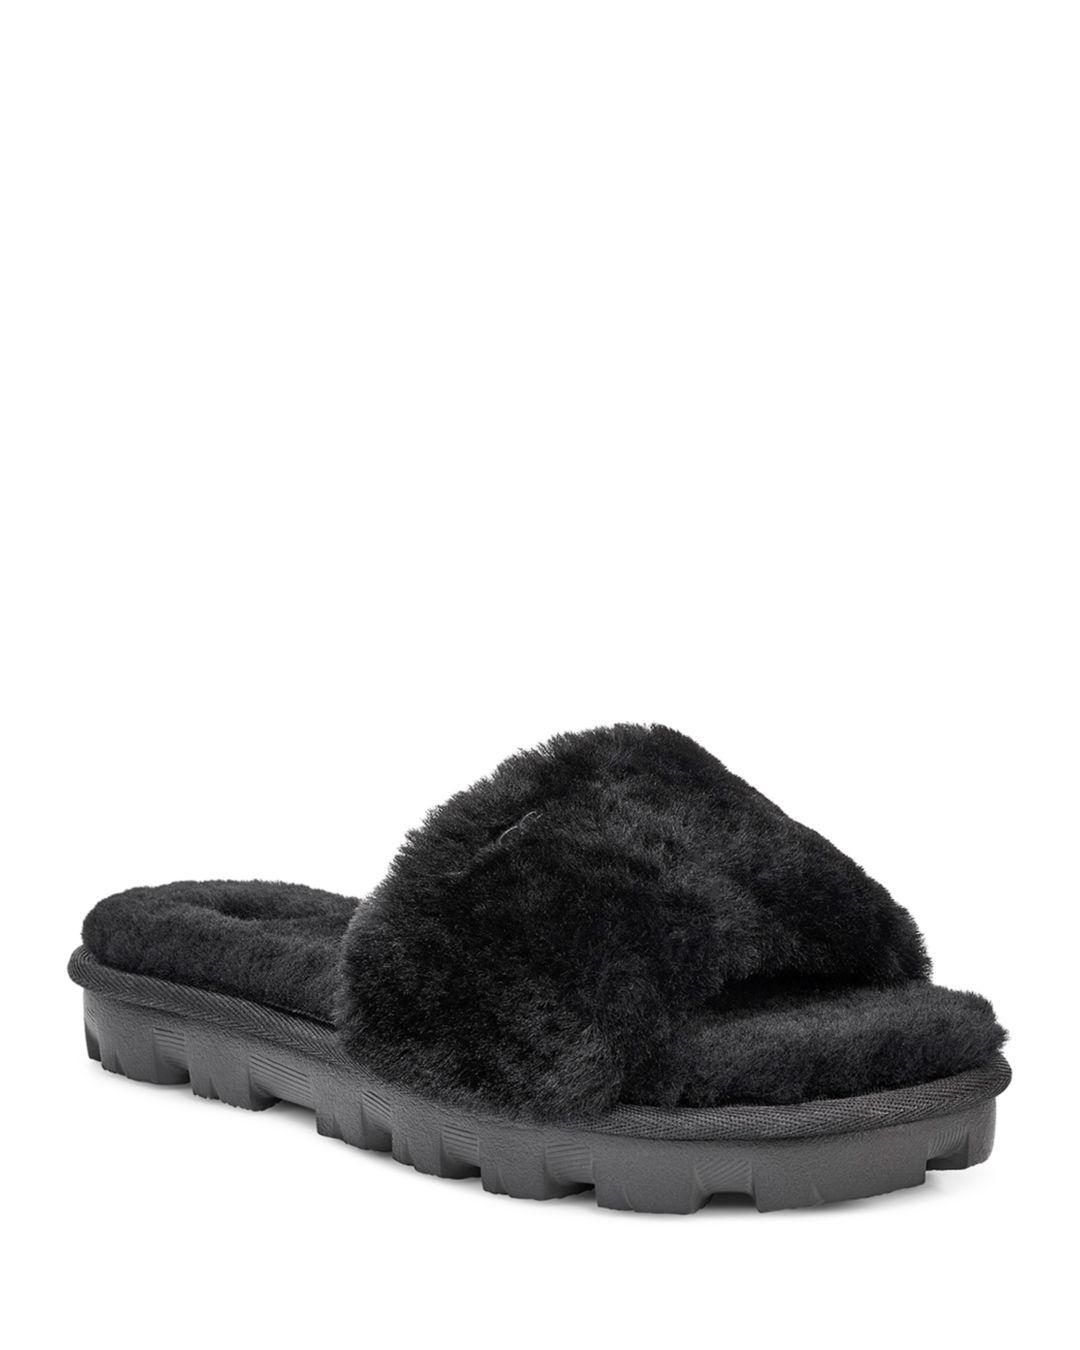 7f17a594c003 Lyst - Ugg Women s Cozette Fur Slide Sandals in Black